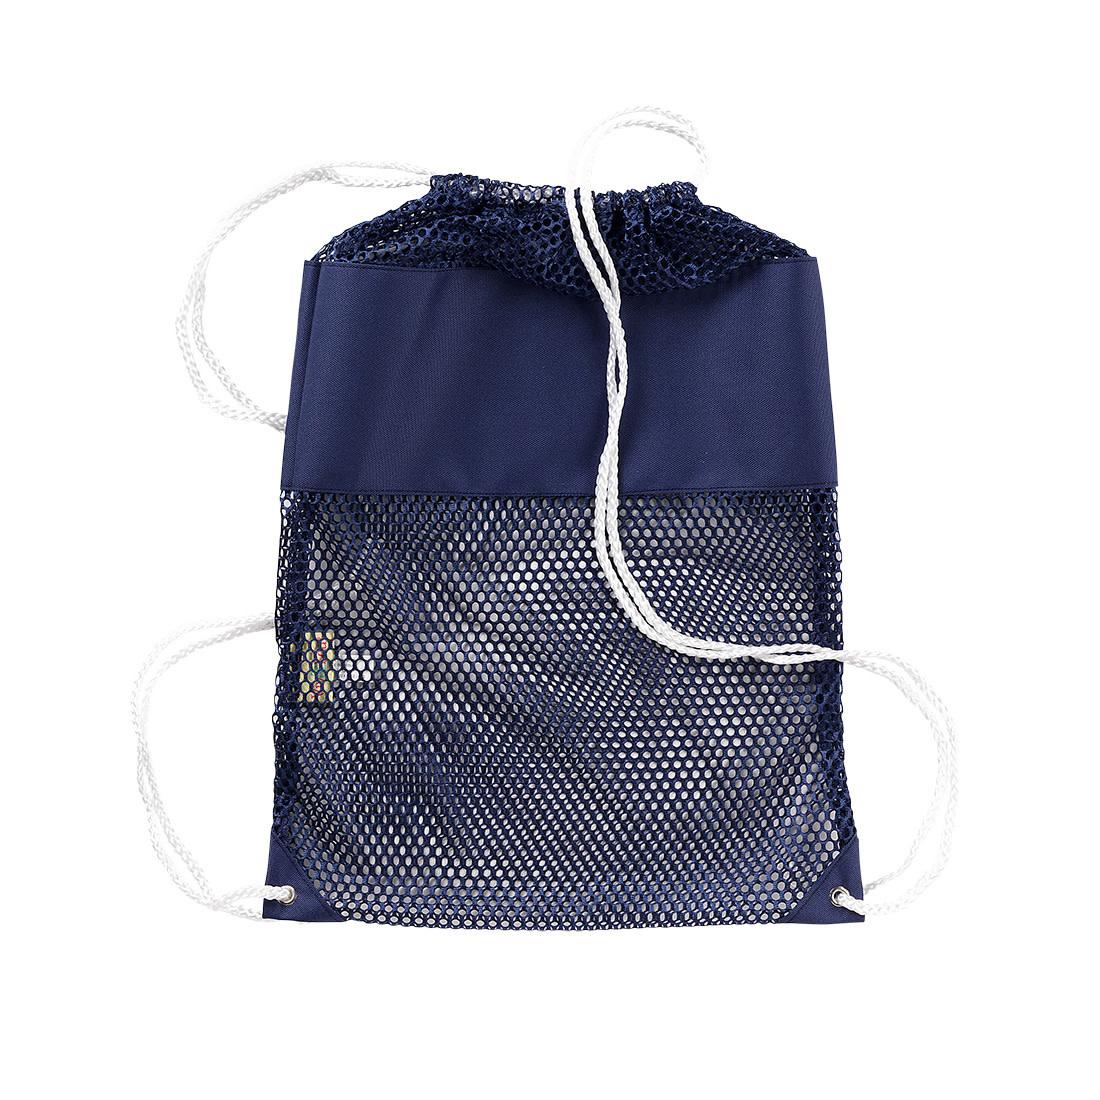 Monogrammed Backpack Kids Beach Bag Beach Bag Monogrammed Beach Bag Monogrammed Mesh Bag Mesh Beach Bag Mesh Bag Kids Mesh Backpack